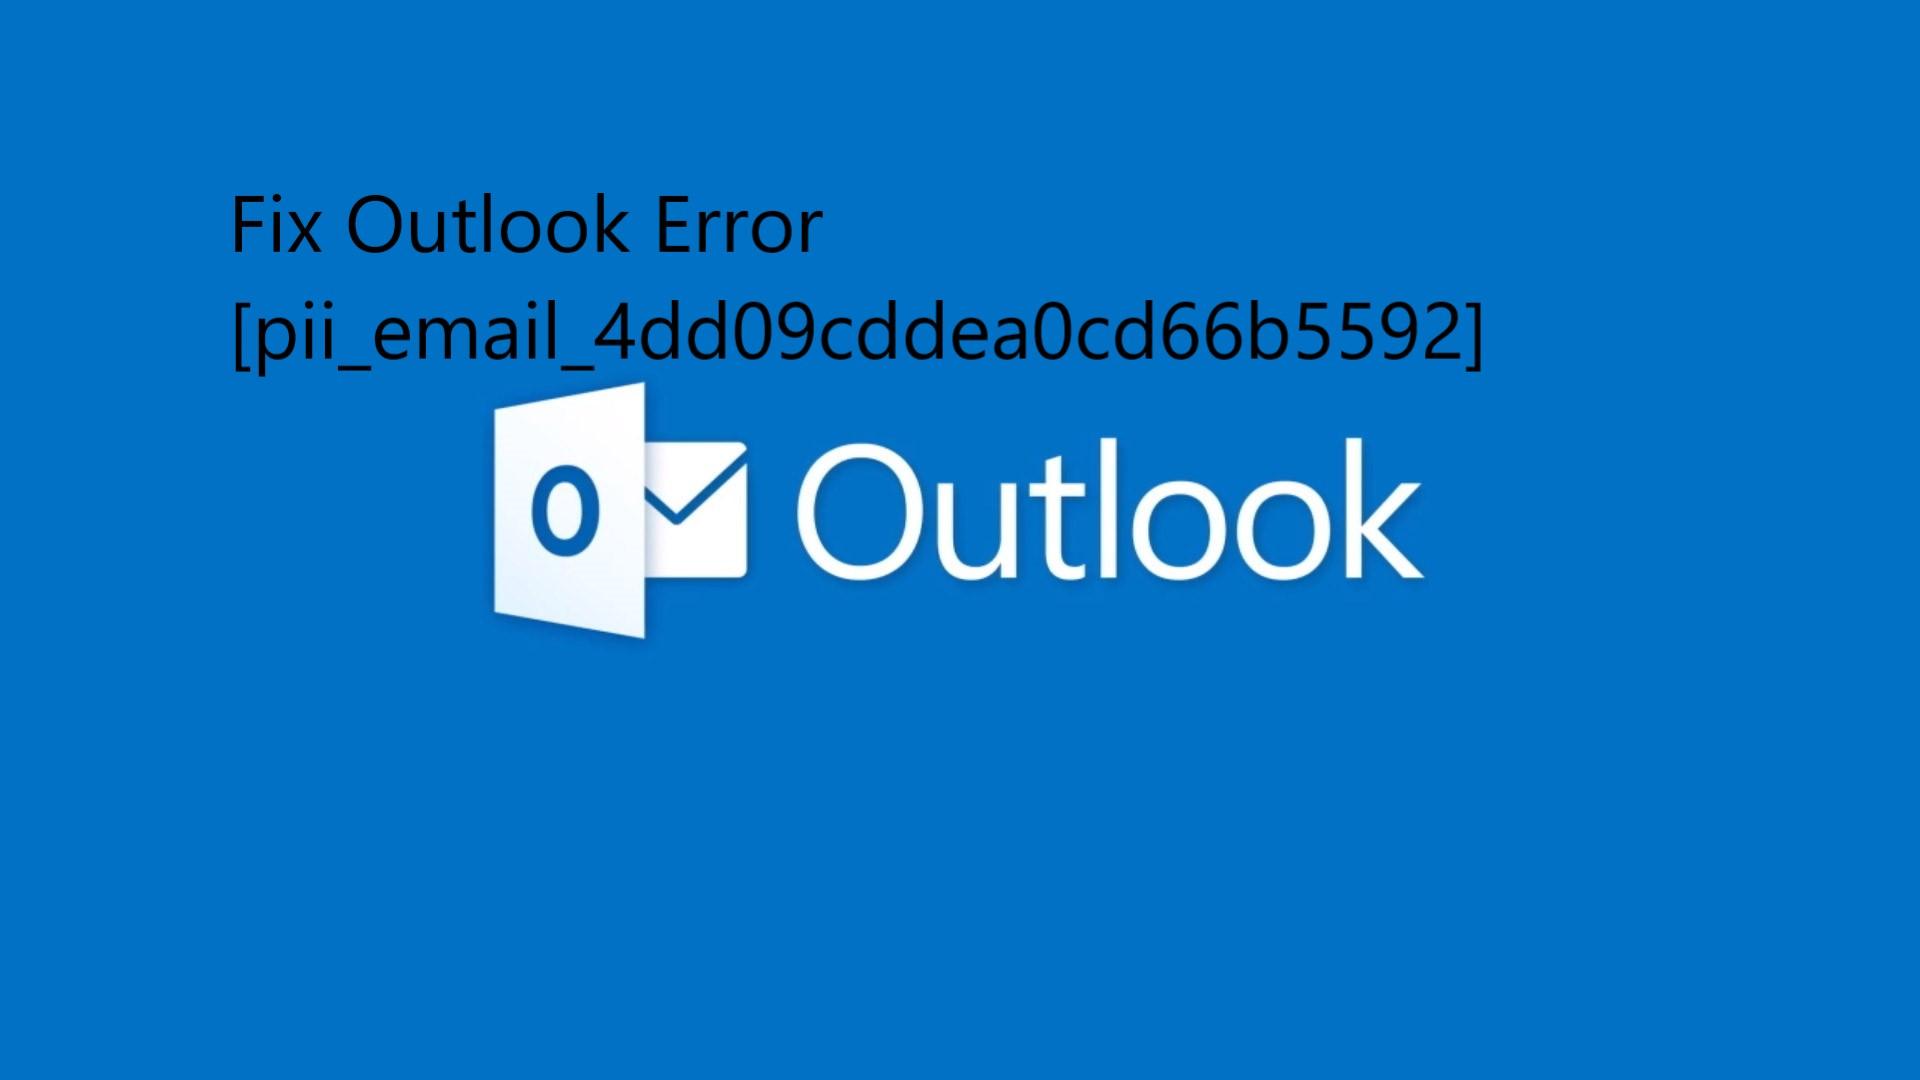 Fix Outlook Error [pii_email_4dd09cddea0cd66b5592]